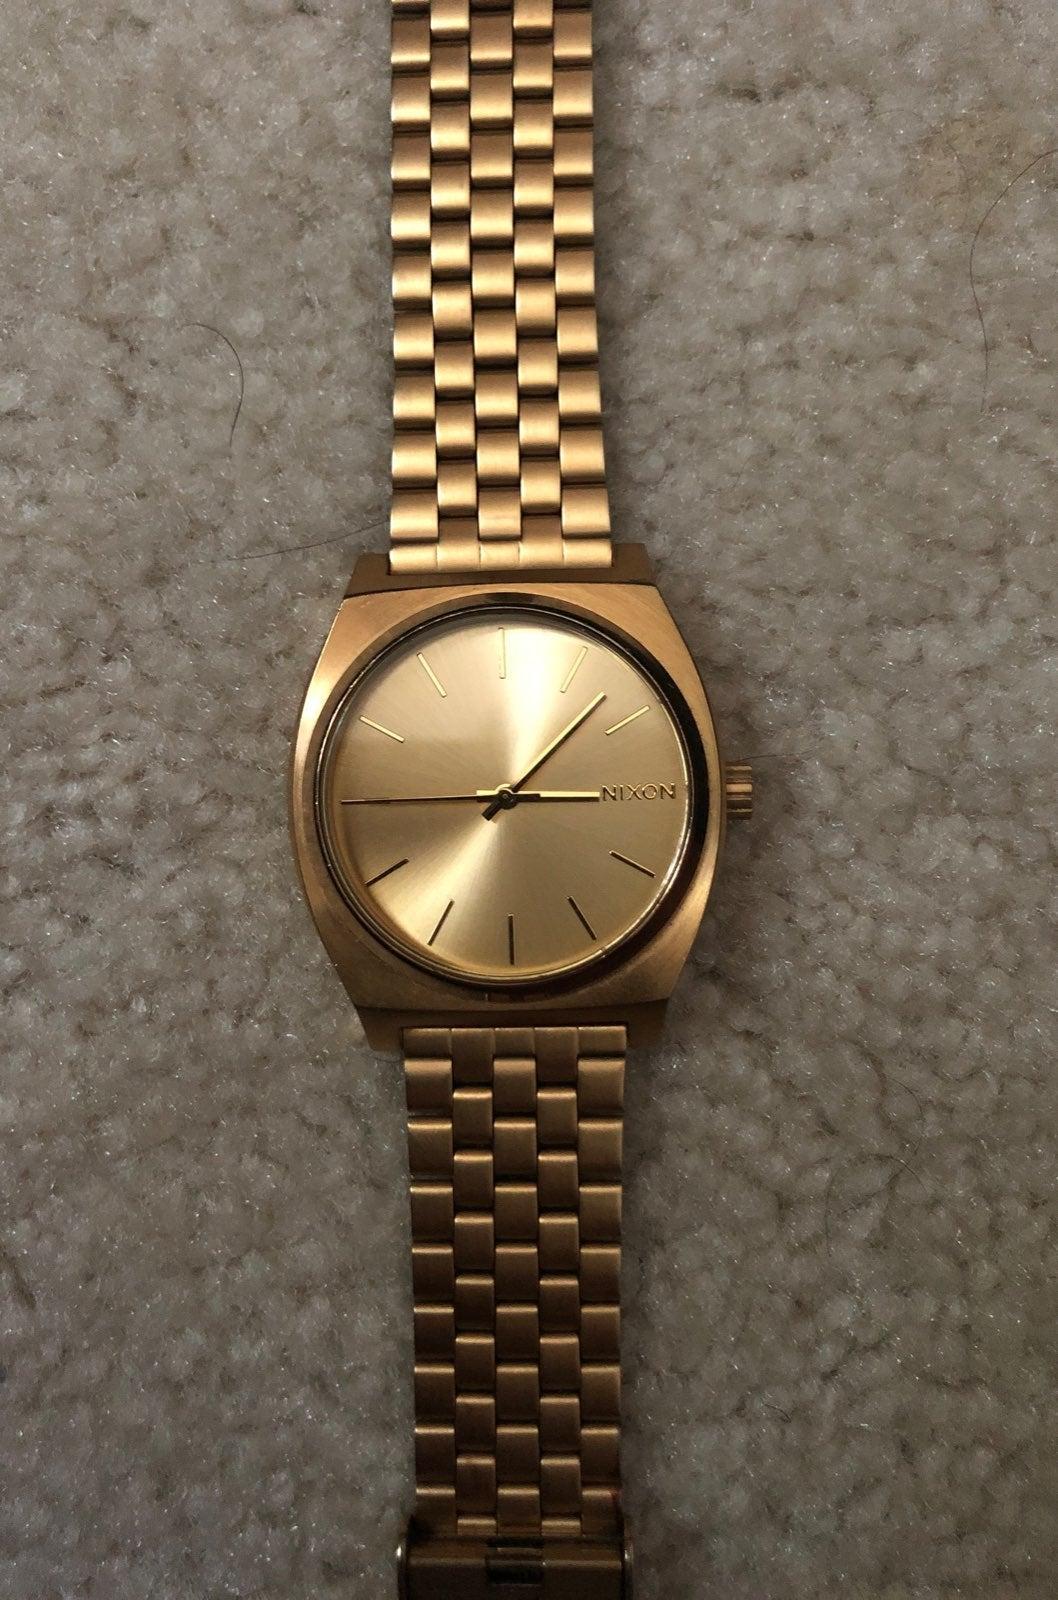 Nixon Time Teller Gold Watch